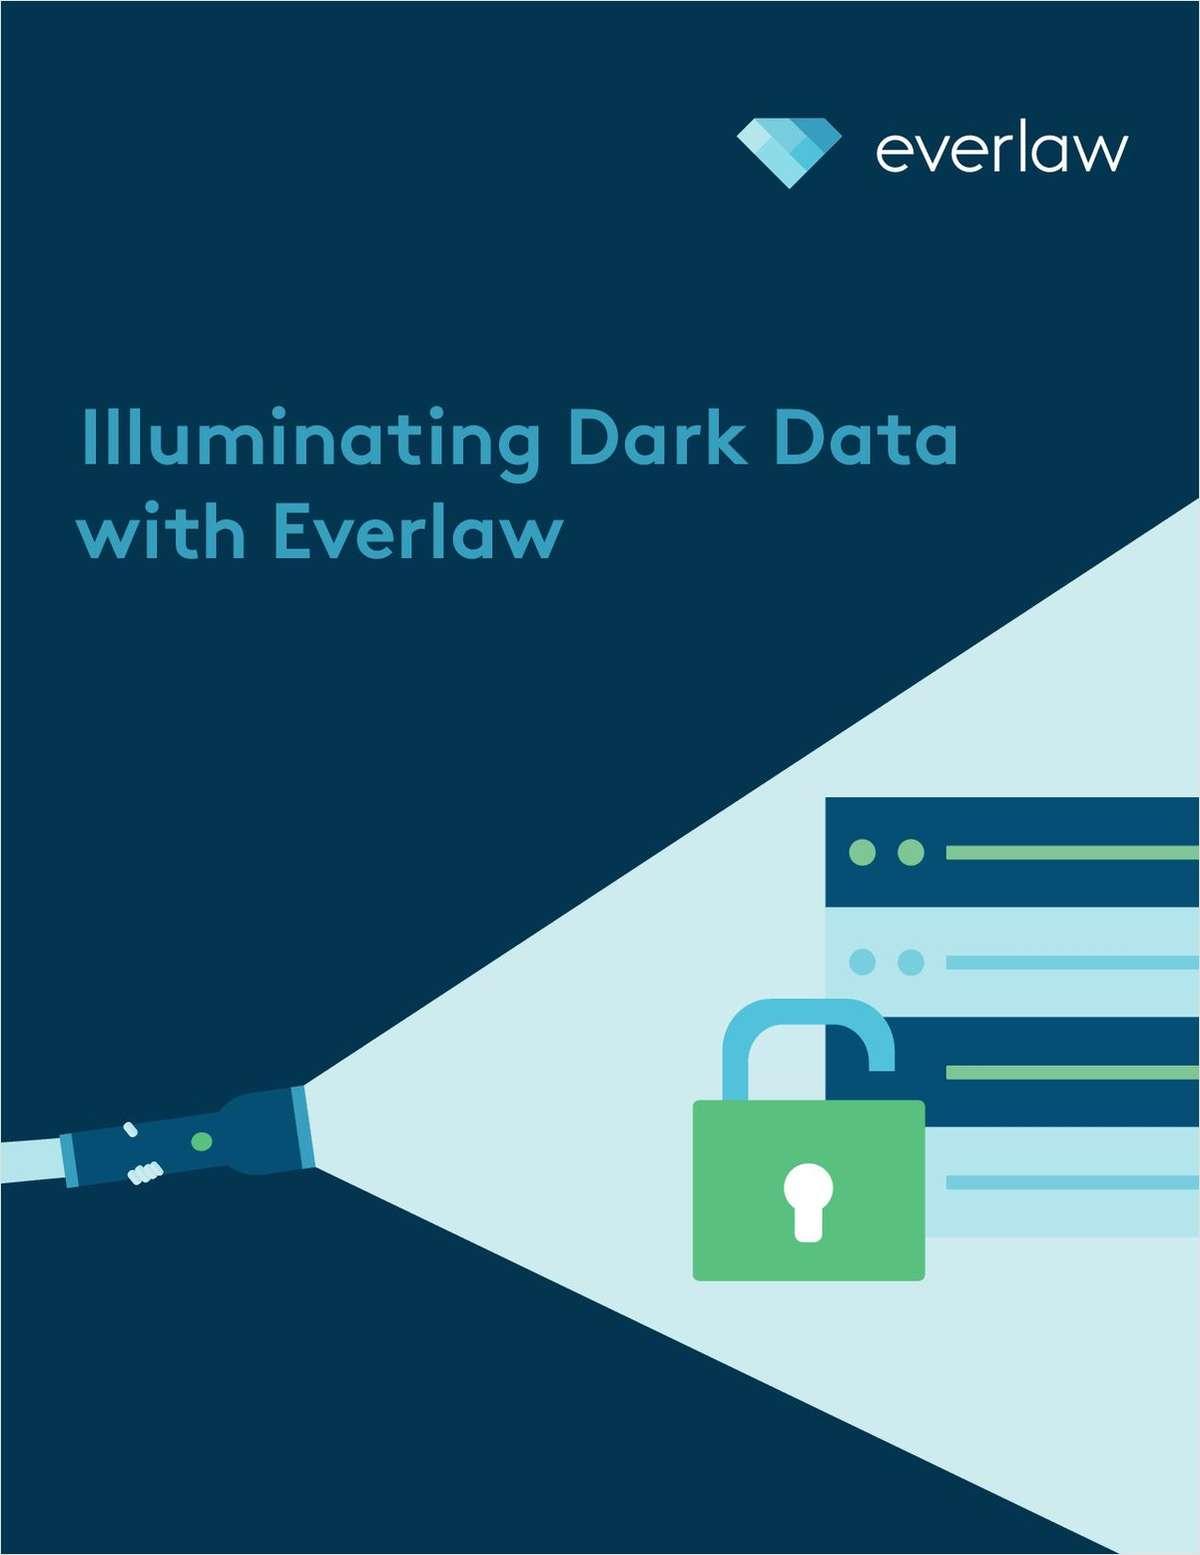 How to Illuminate Dark Data For Litigation or Investigation